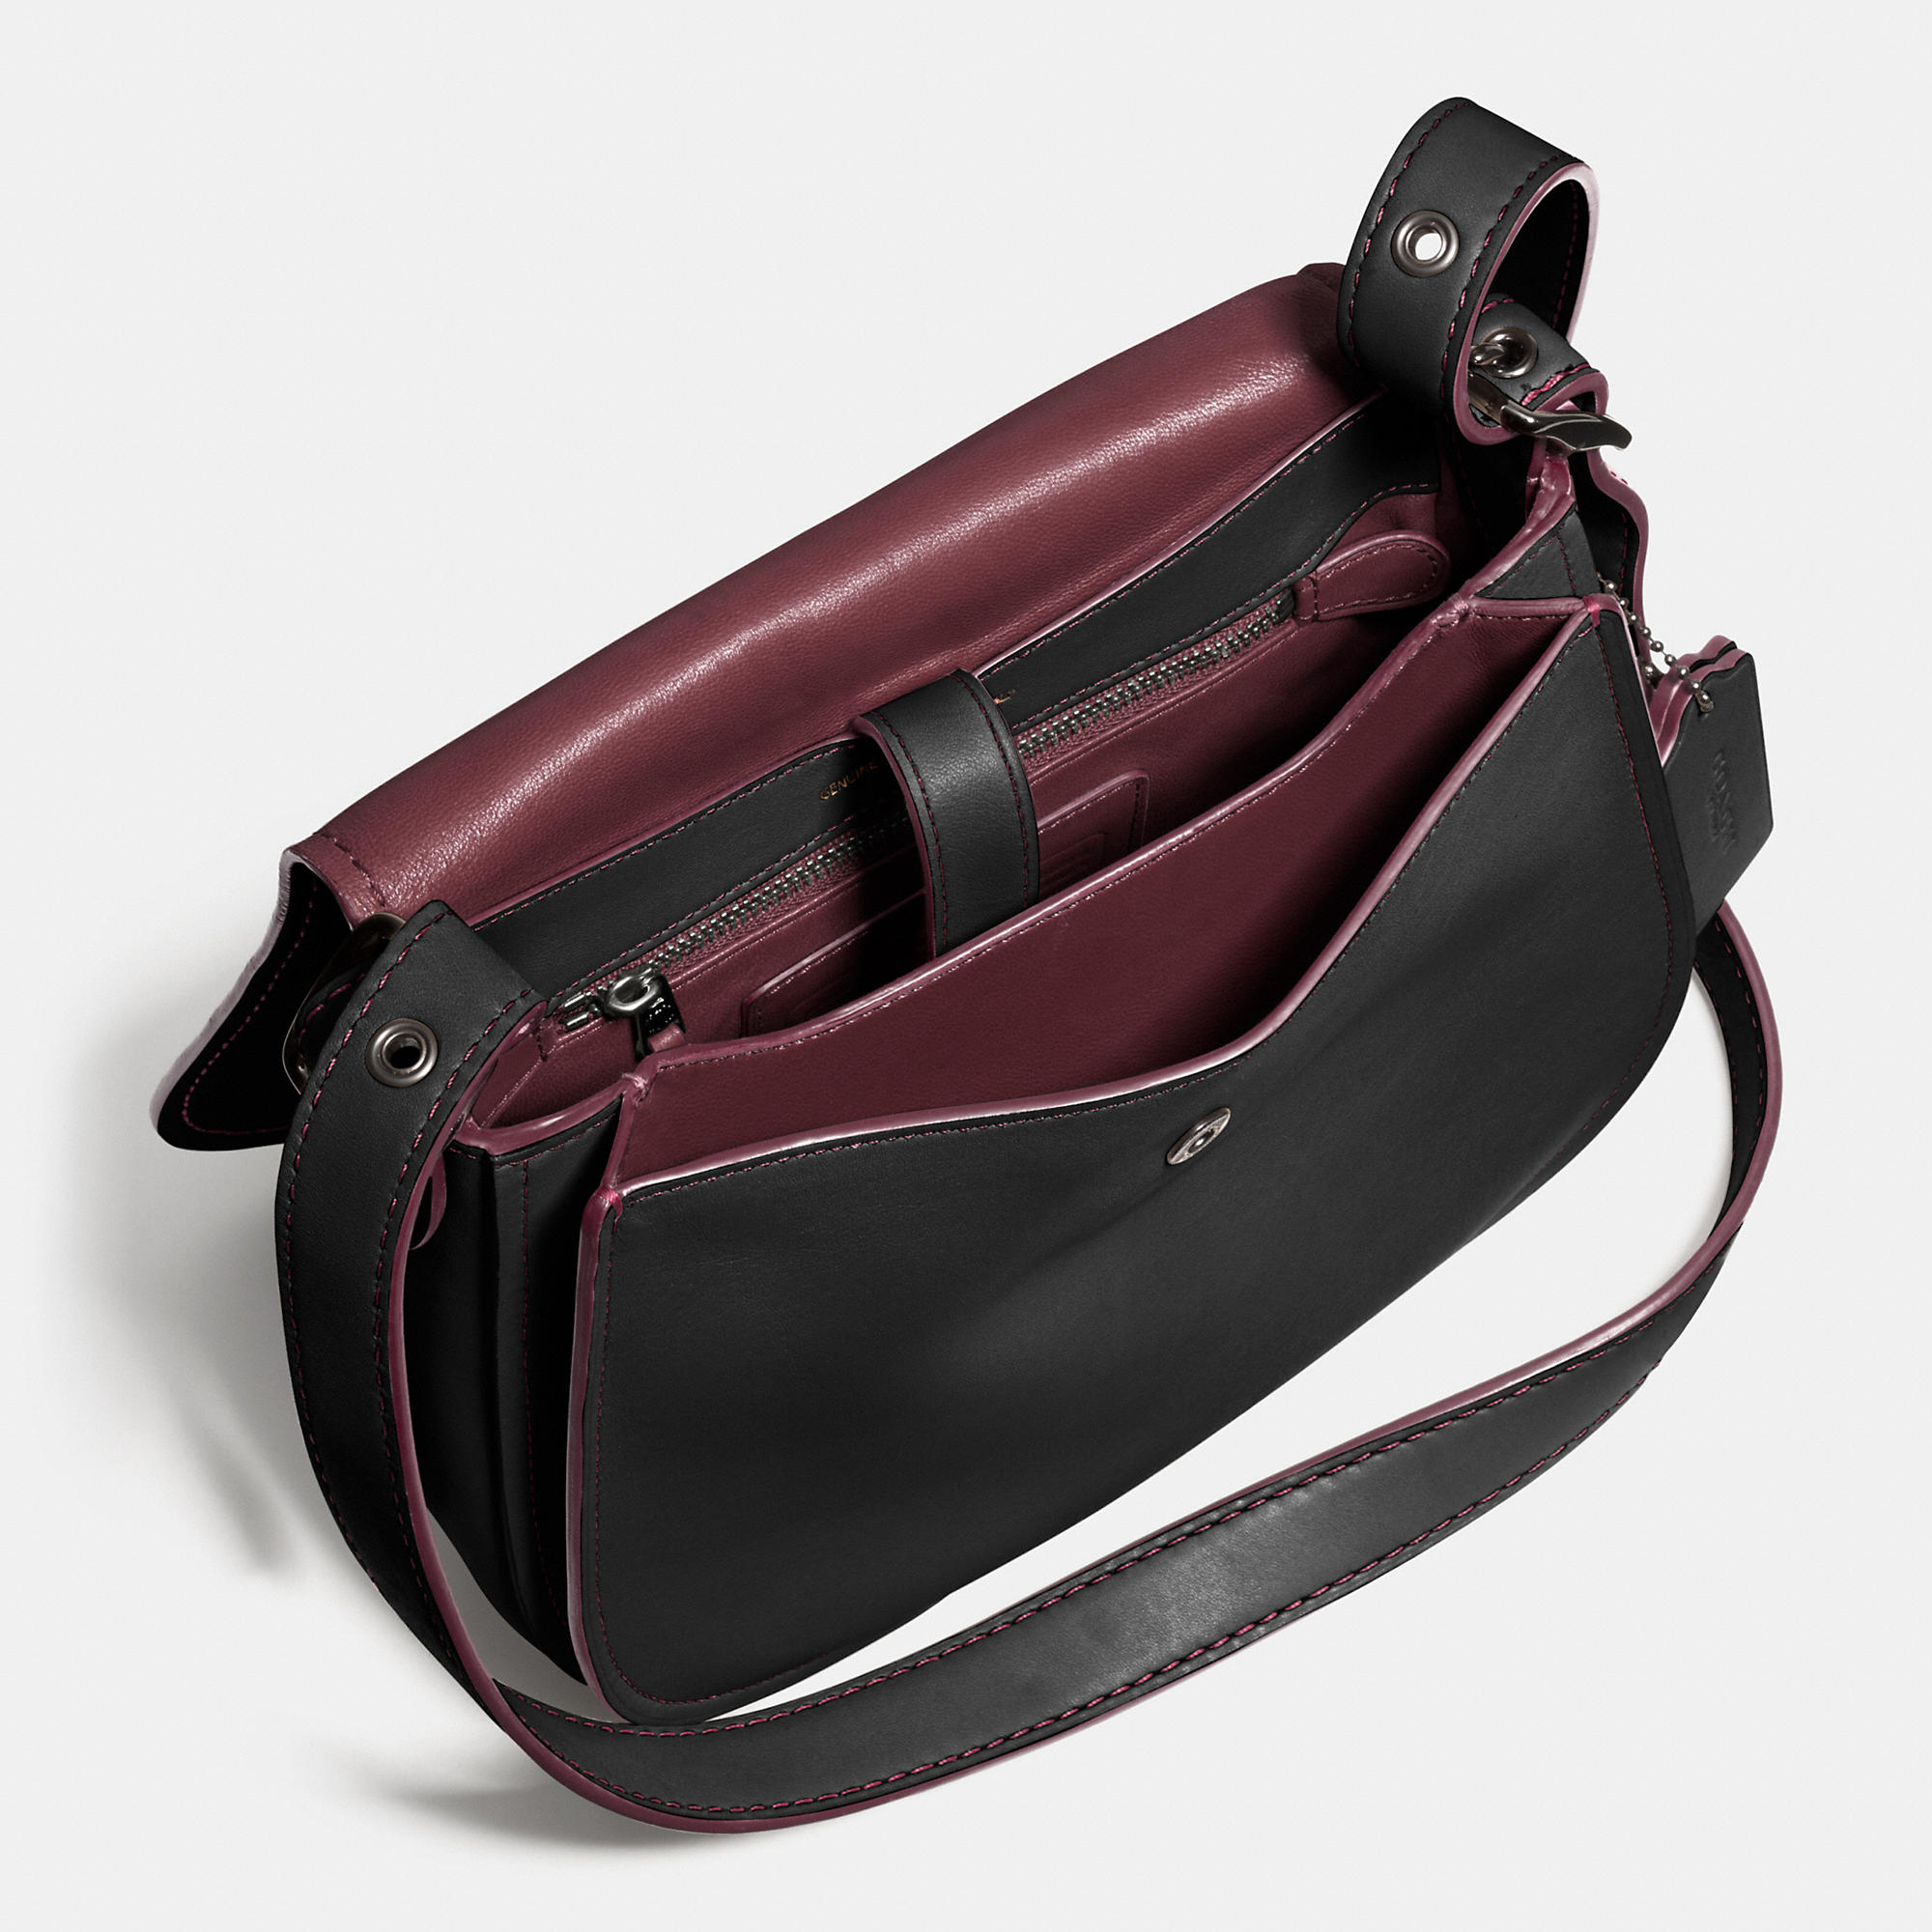 576256f347 coach saddle bag handbag